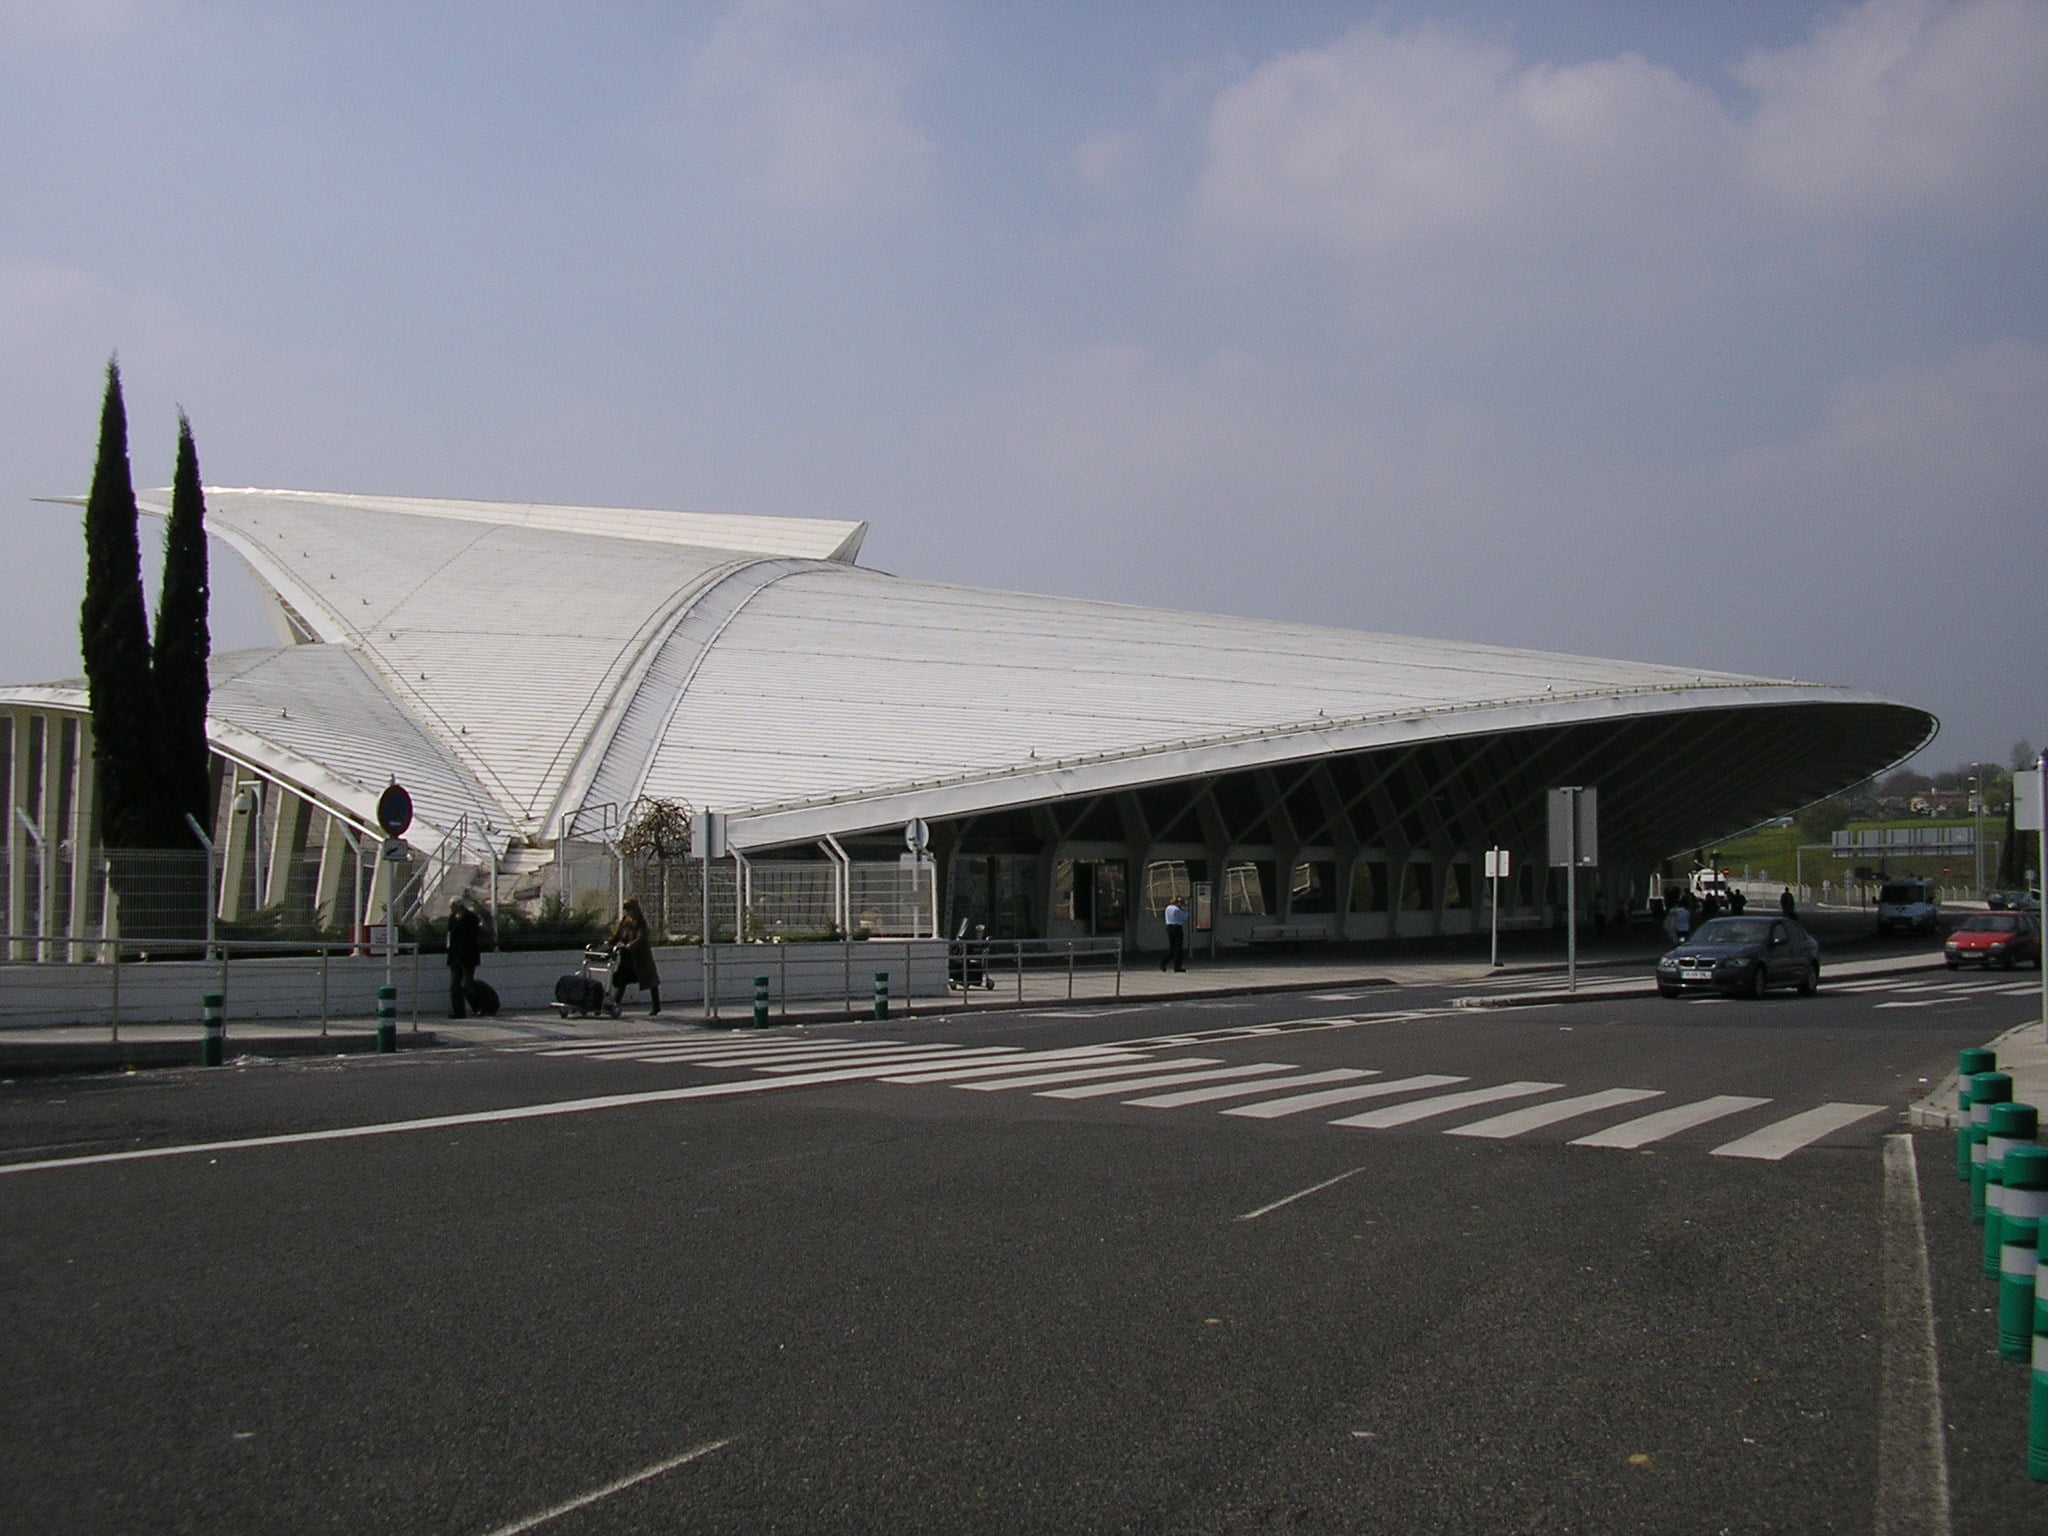 Aeropuerto de Bilboa